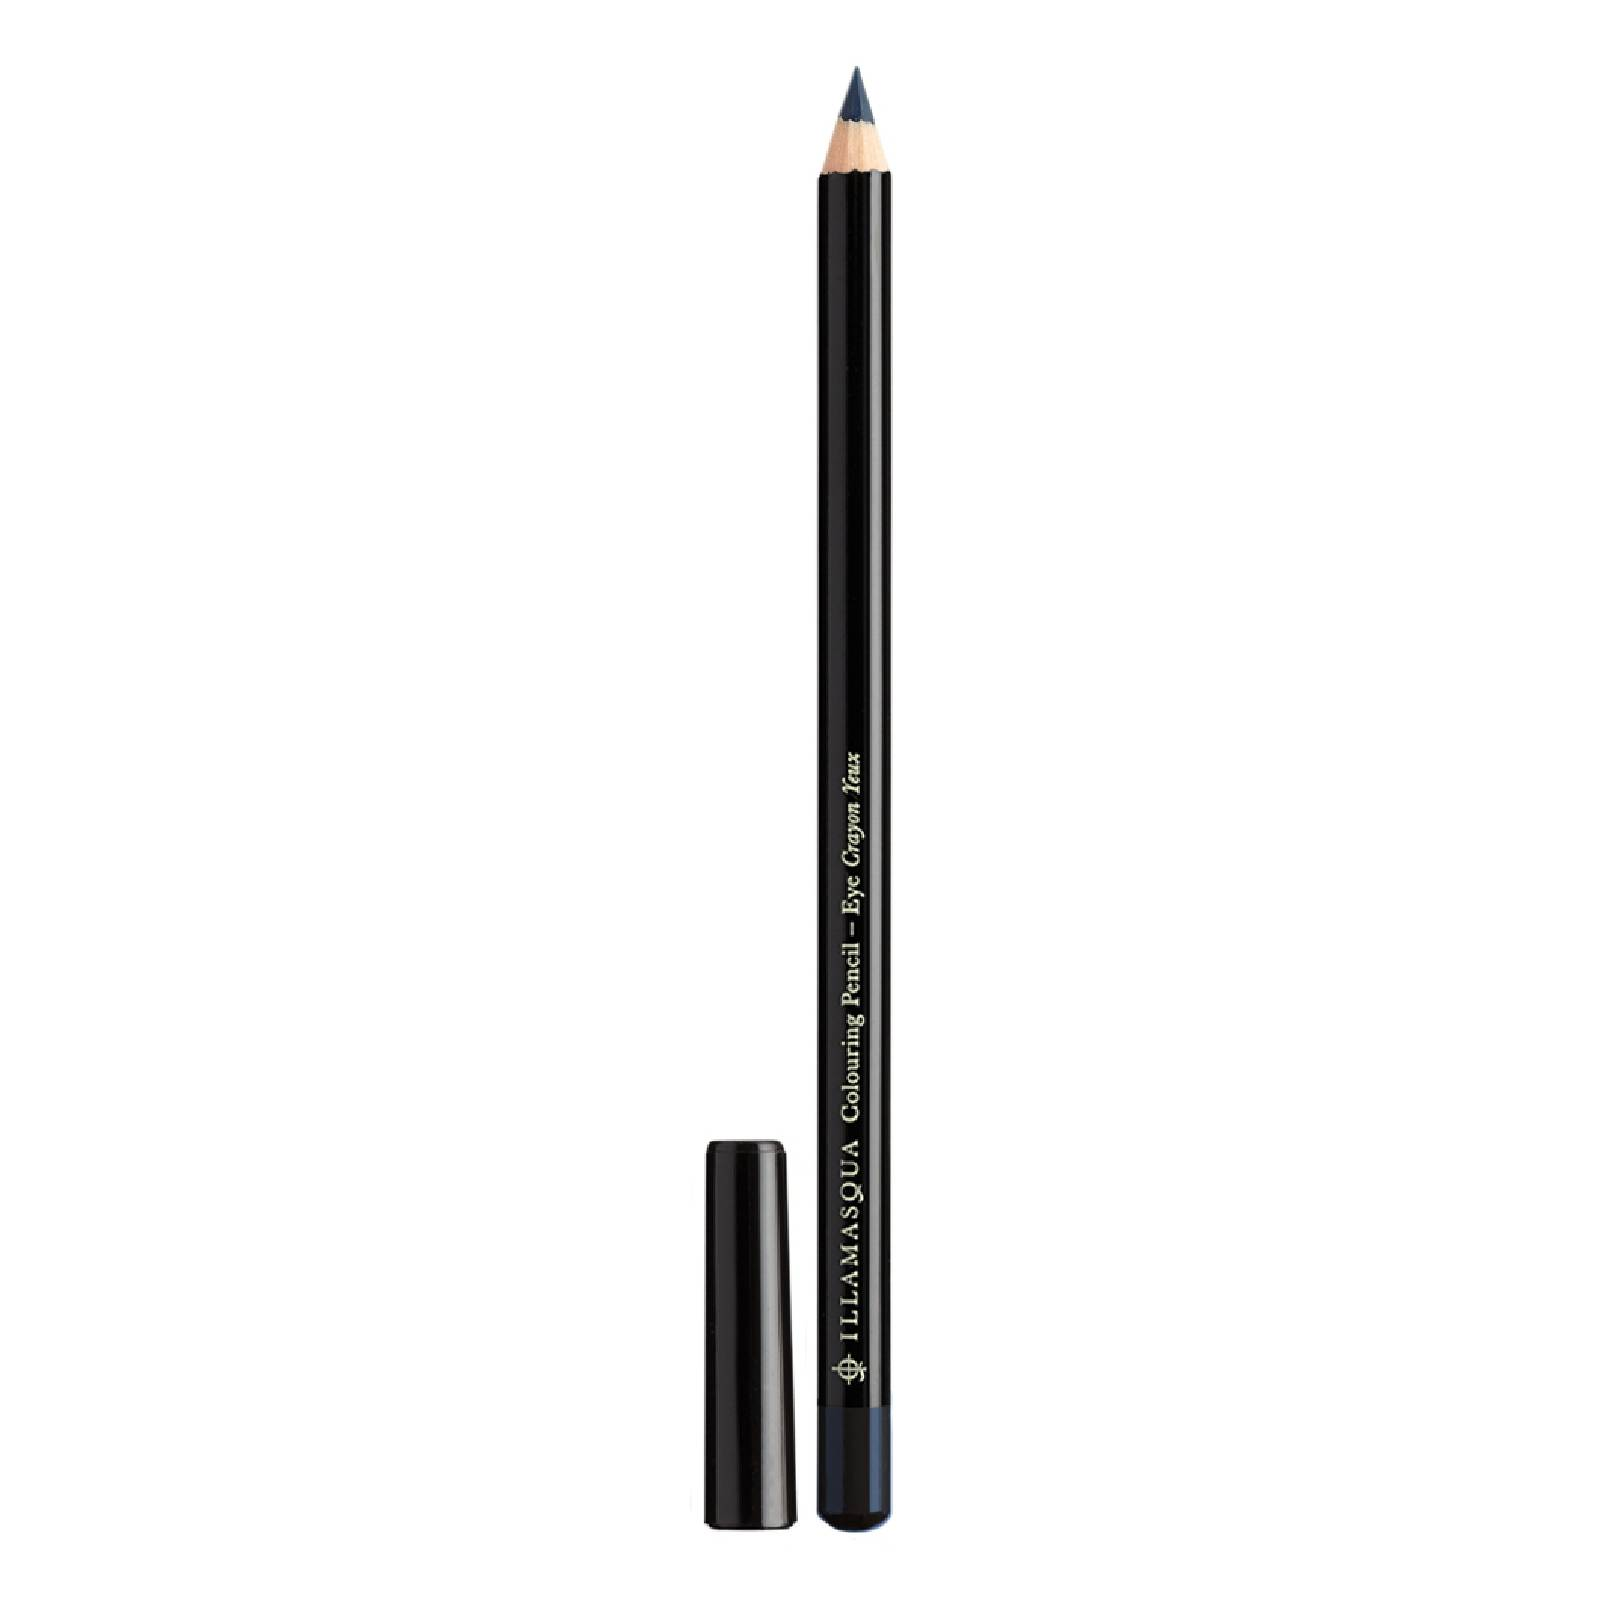 Illamasqua Colouring Eye Pencil - Navy